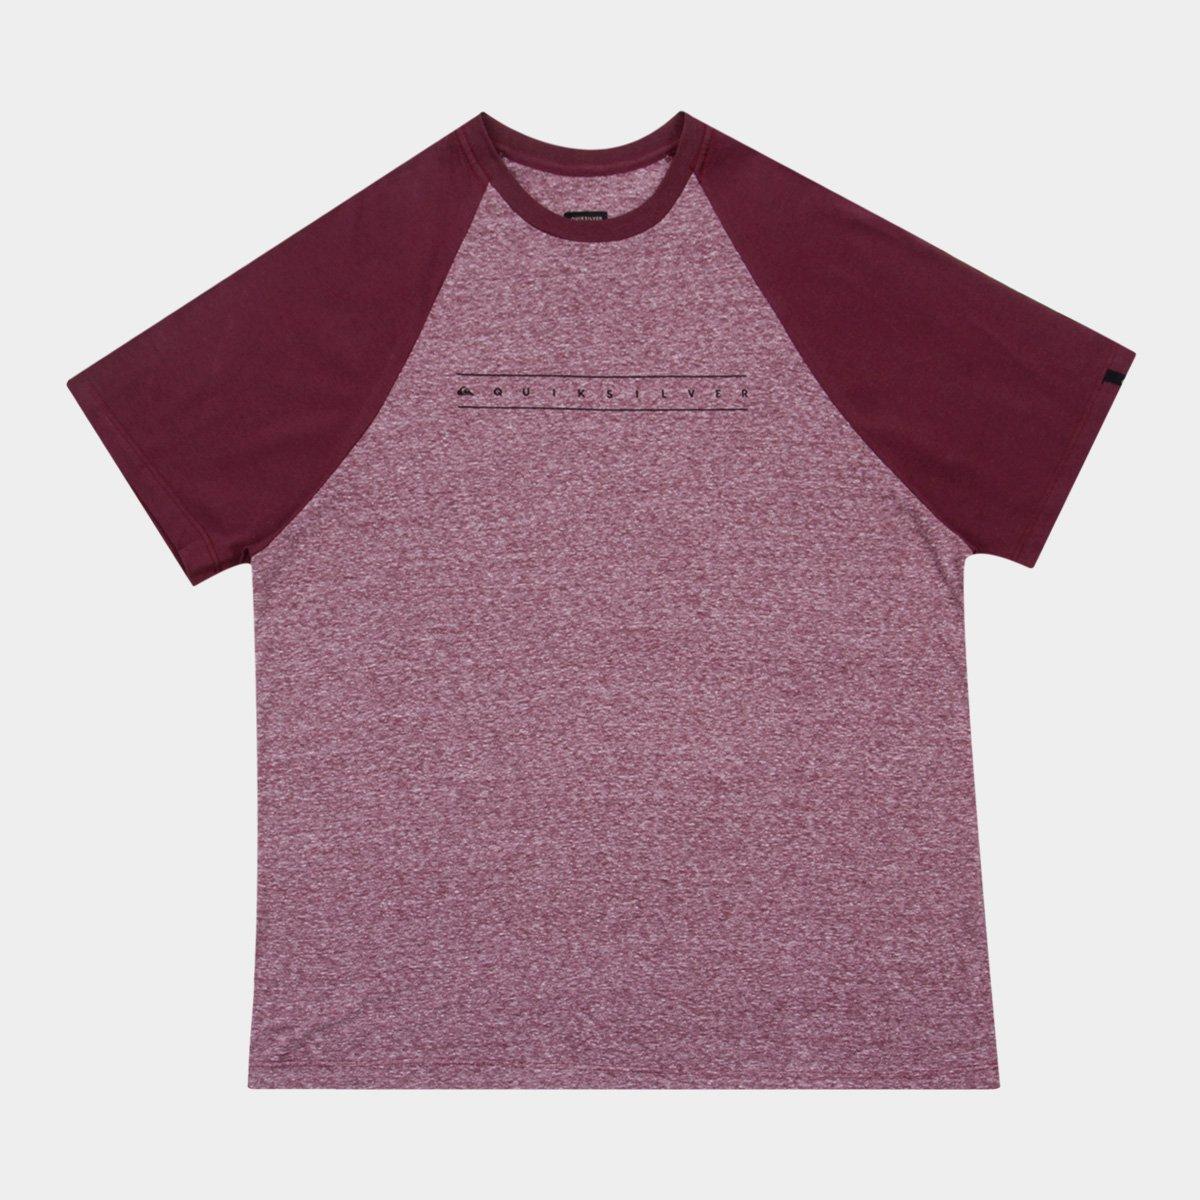 b8af7def541ae Camiseta Quiksilver Plus Size Especial Raglan Pack Iii Masculina